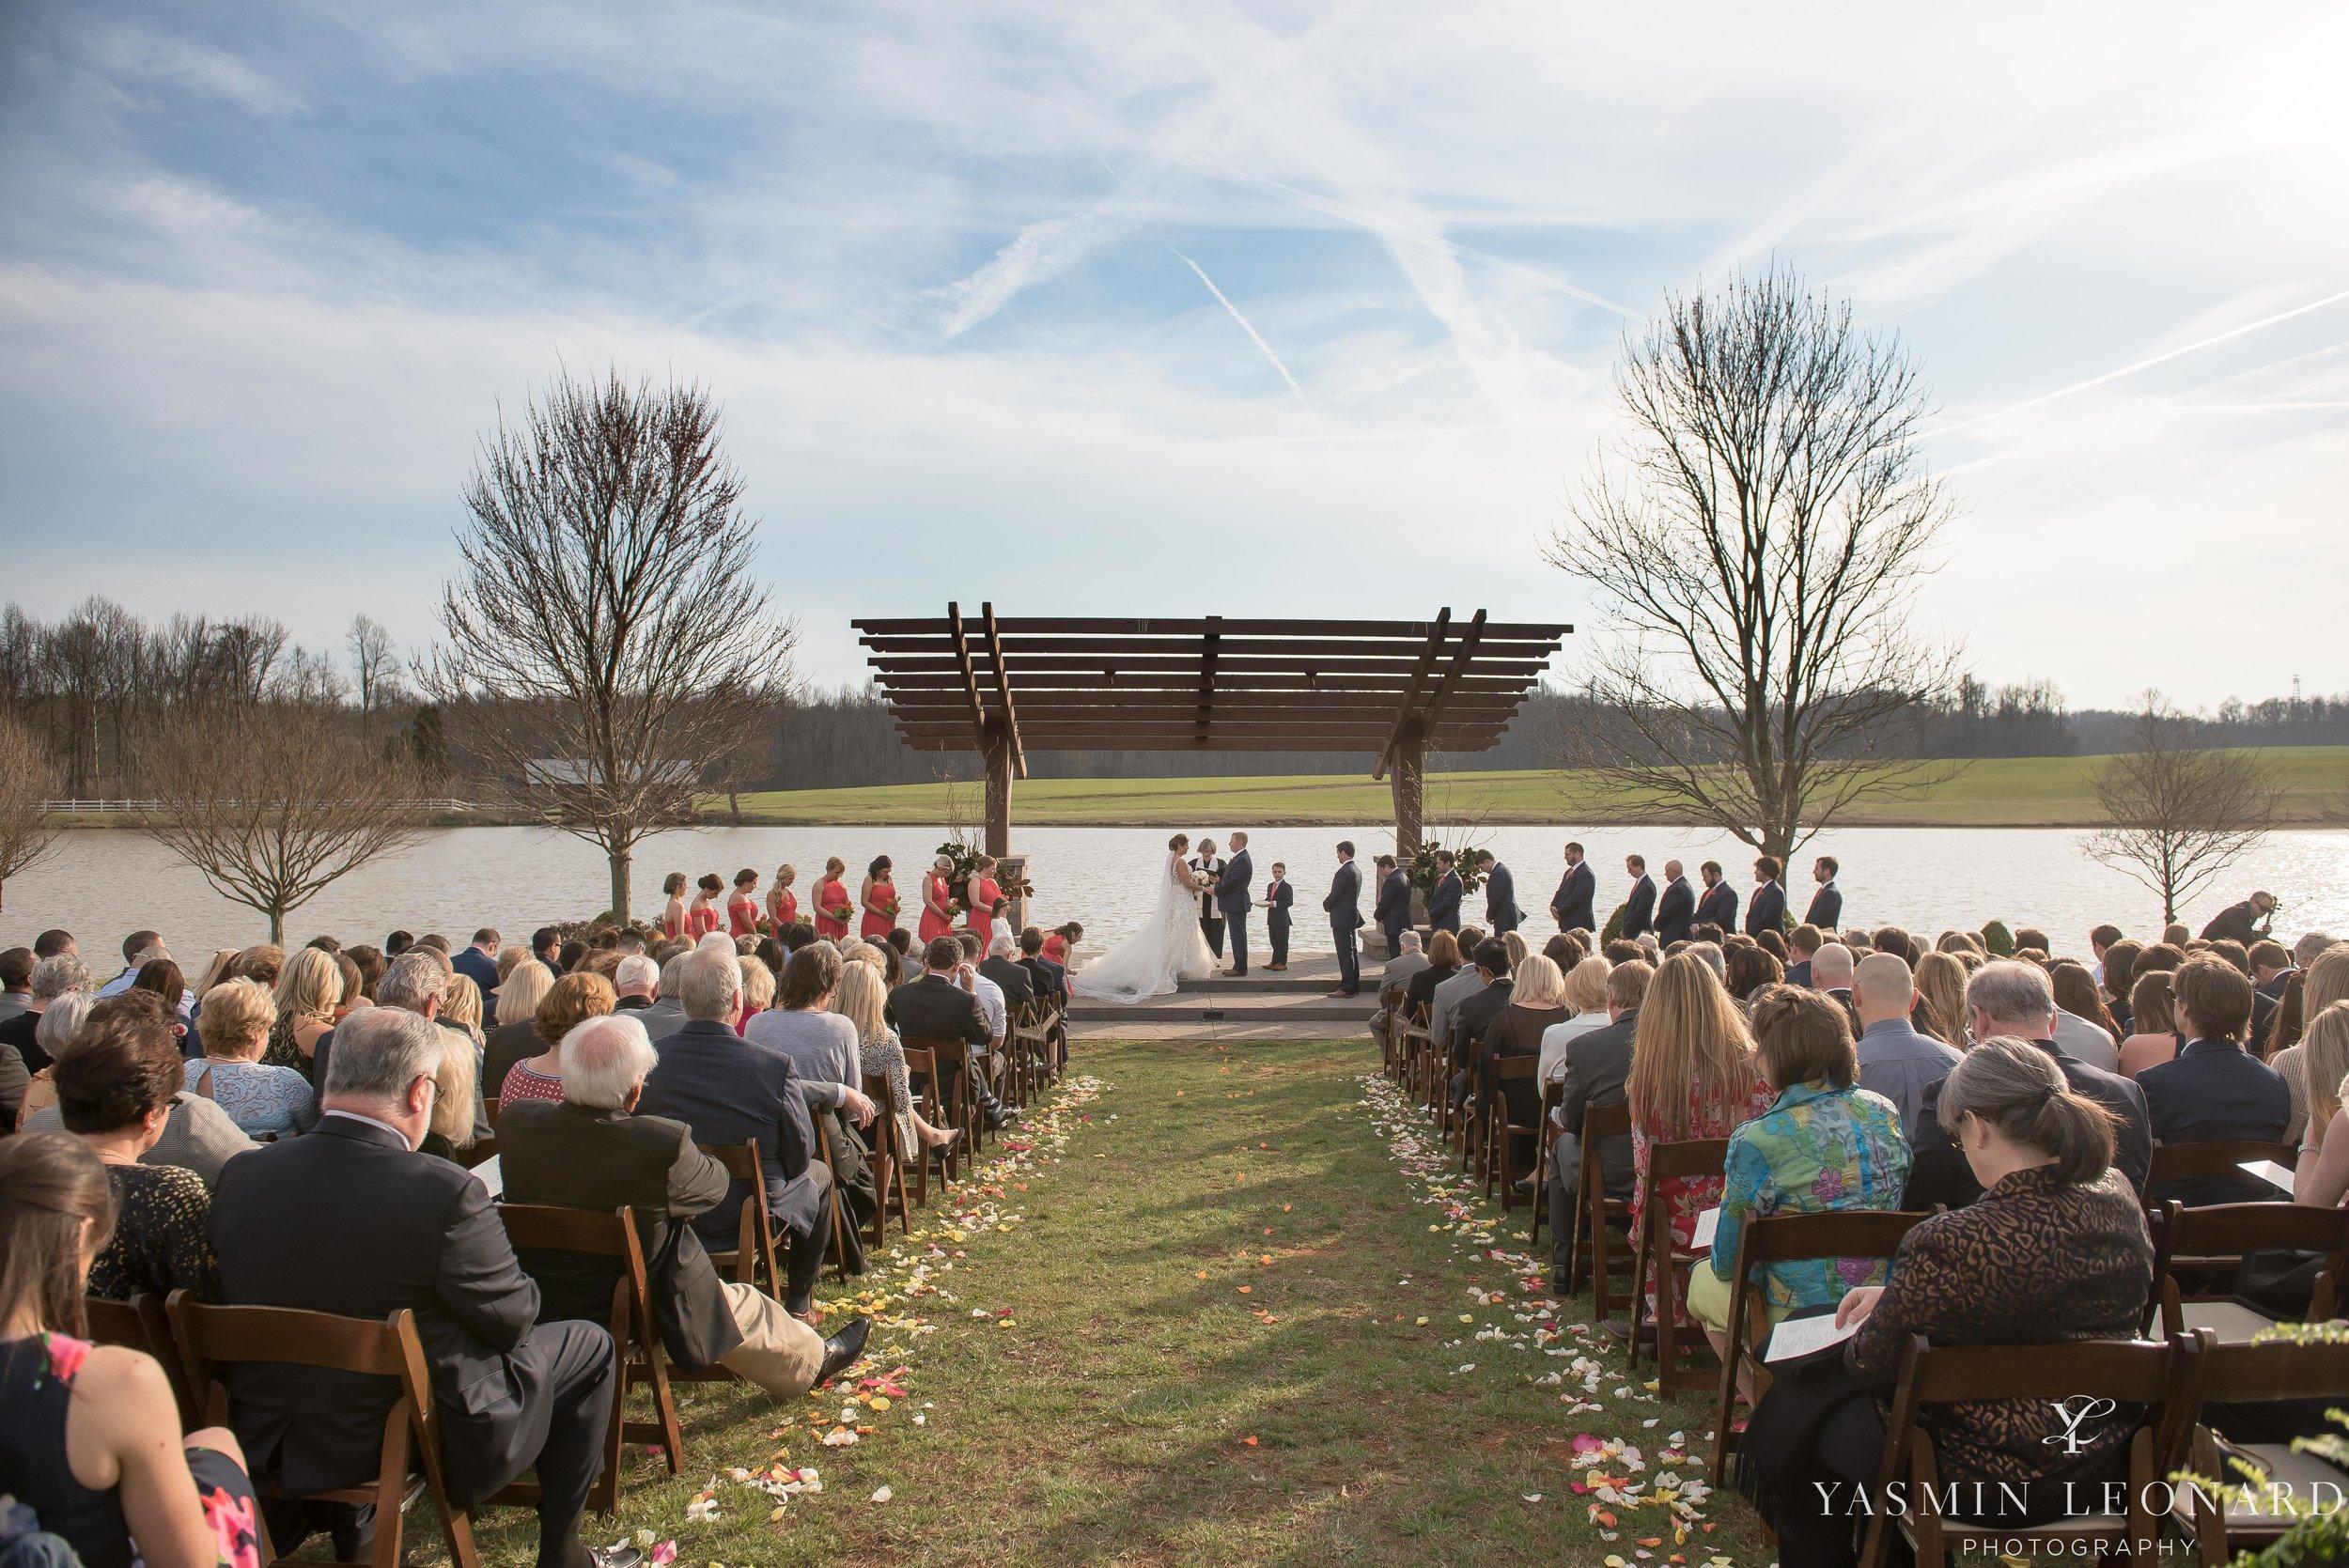 Adaumont Farm - Adaumont Farm Weddings - Trinity Weddings - NC Weddings - Yasmin Leonard Photography-31.jpg